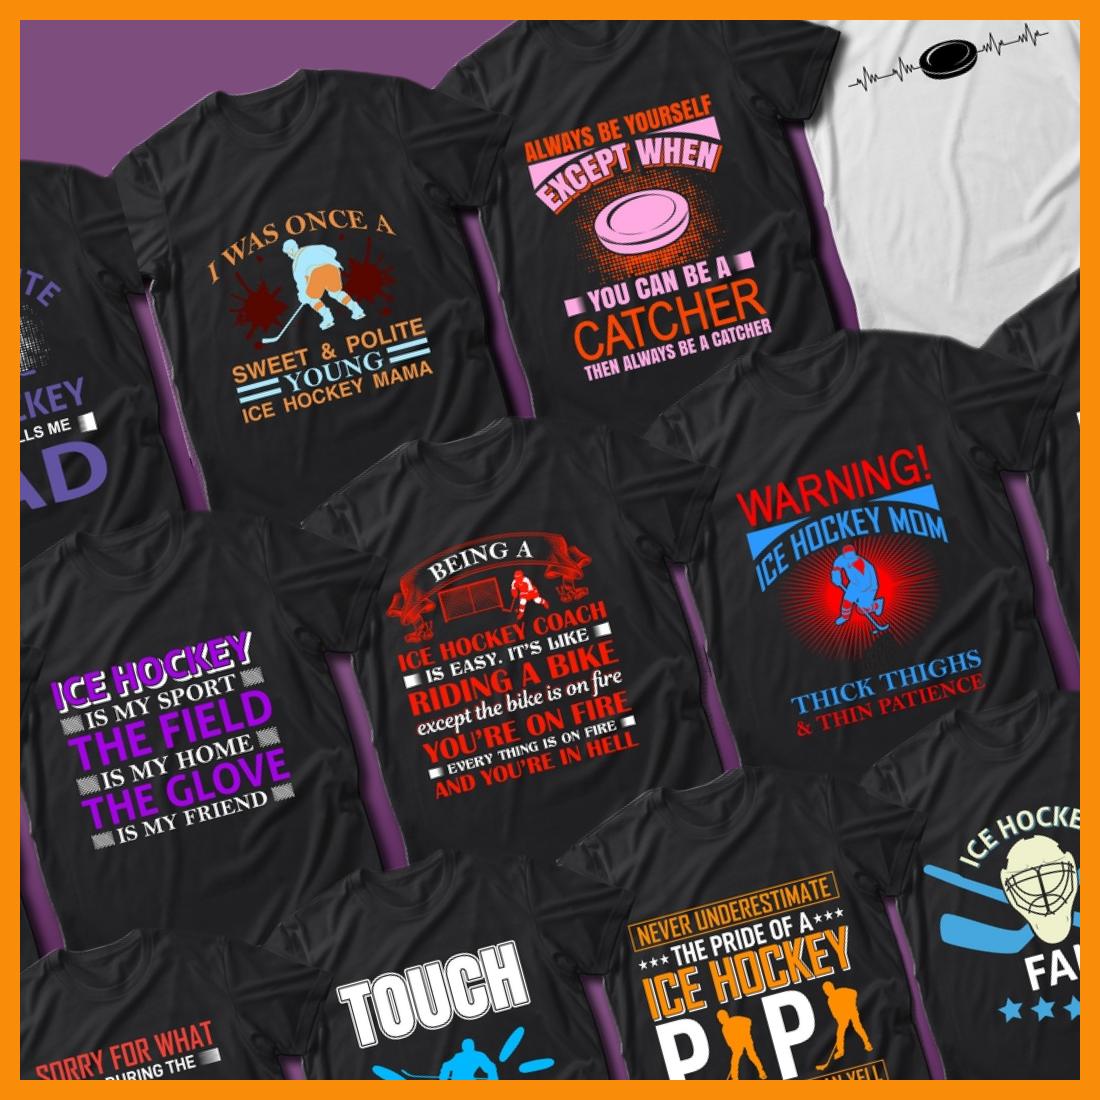 2 40 Ice Hockey Quotes T Shirt Designs Bundle